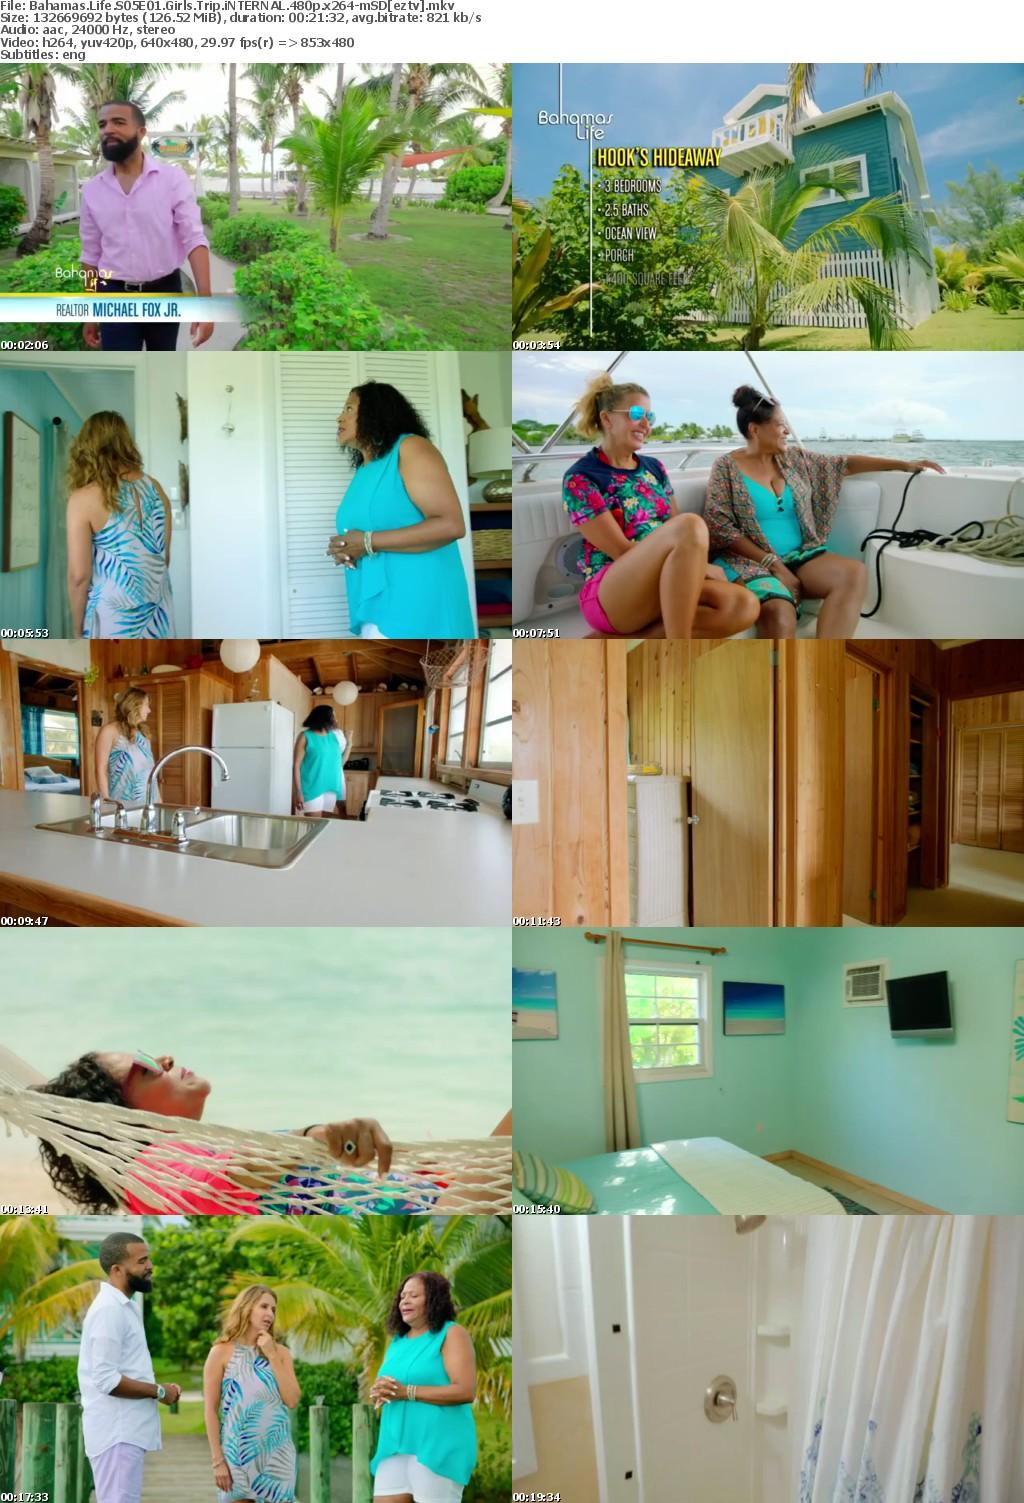 Bahamas Life S05E01 Girls Trip iNTERNAL 480p x264-mSD